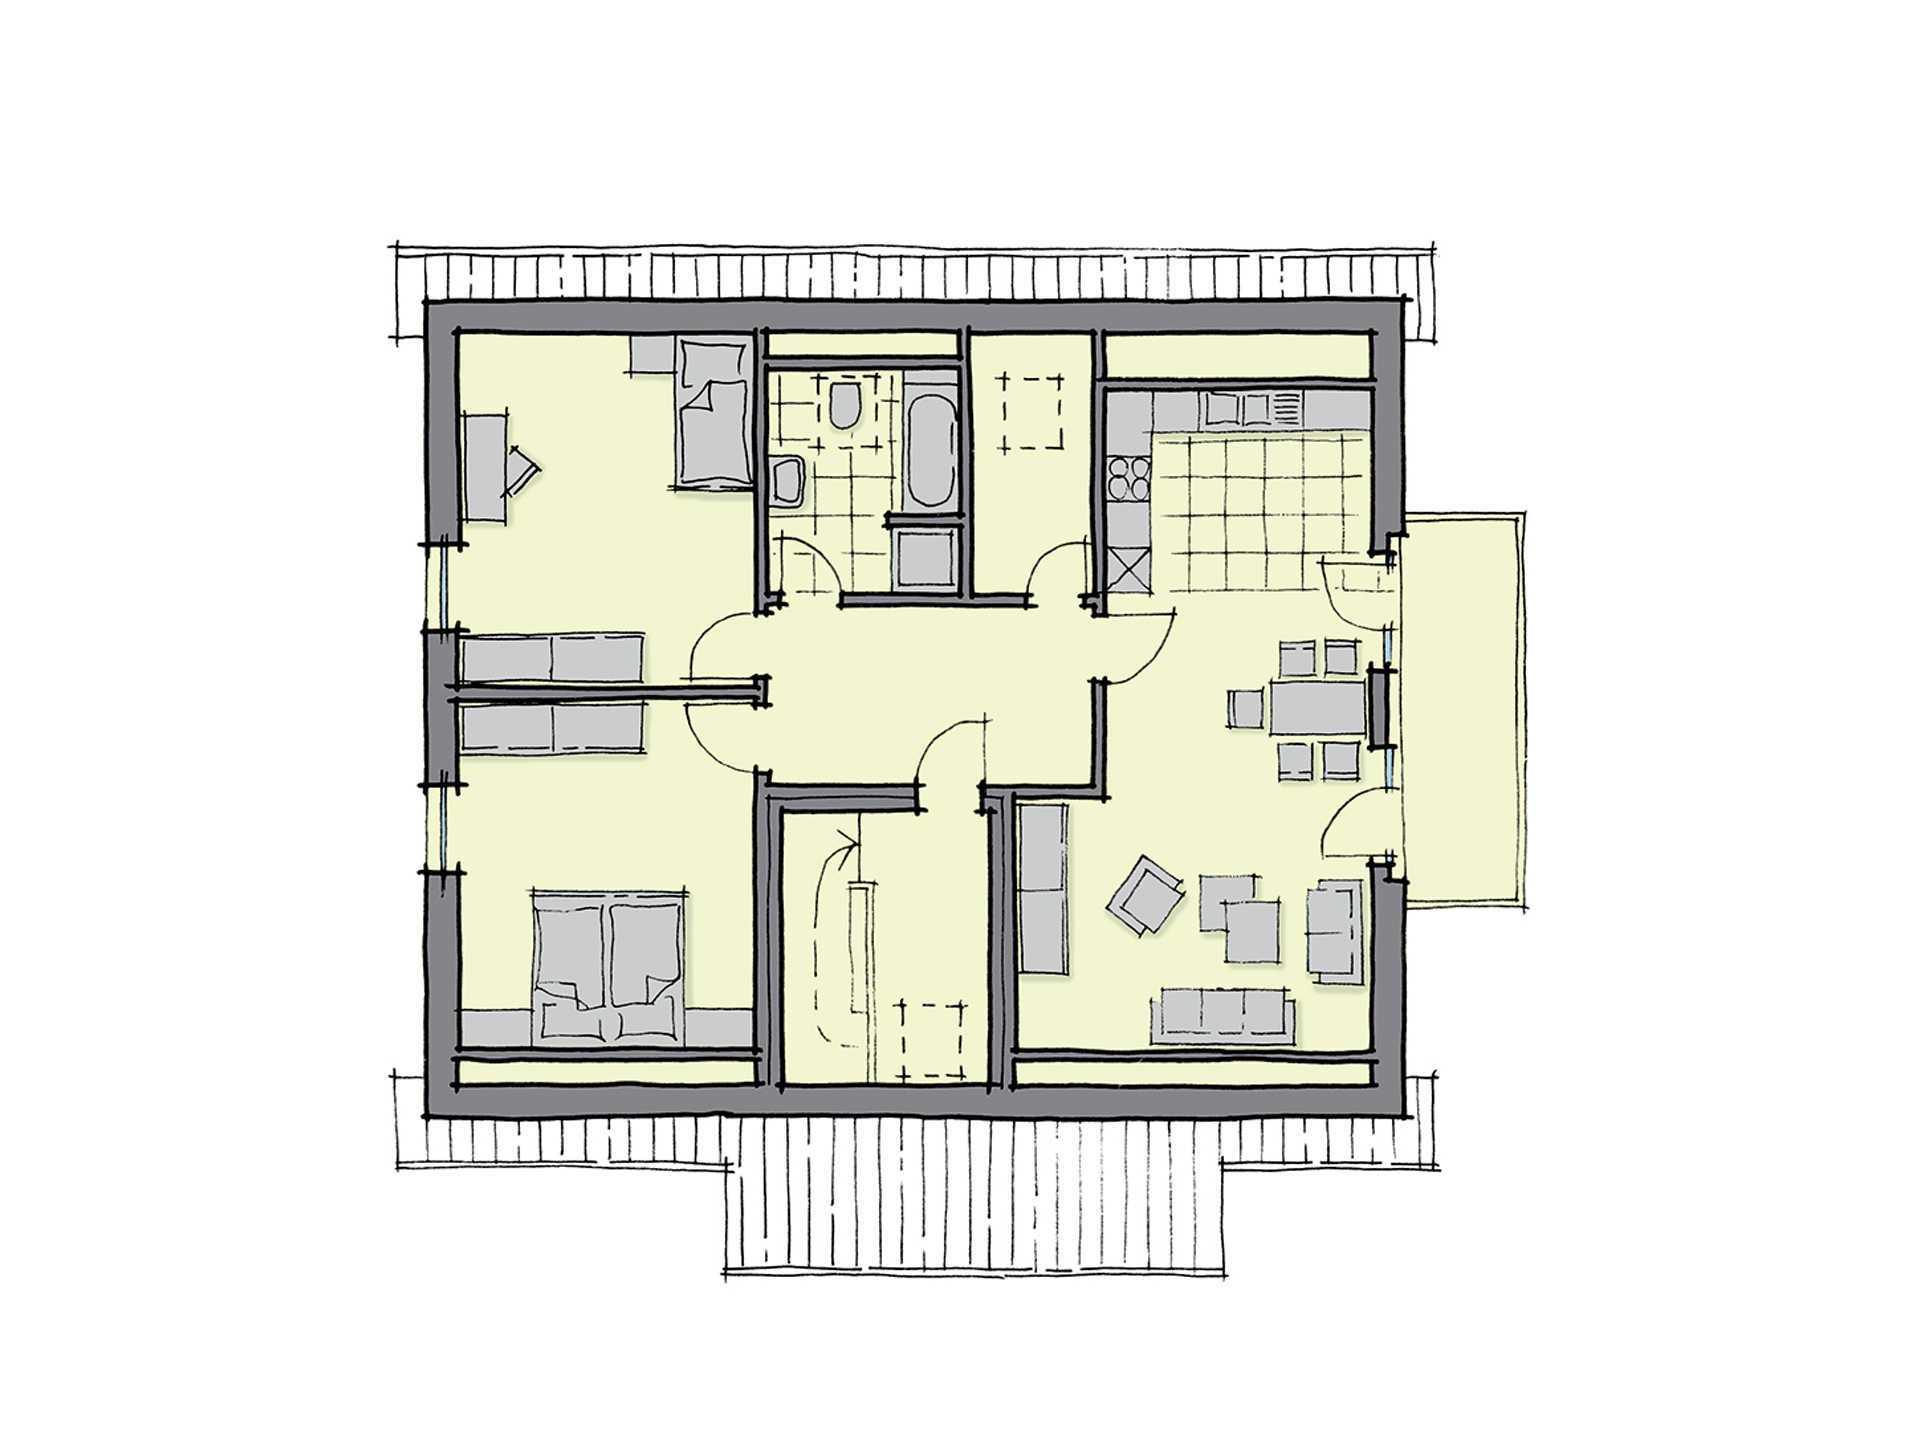 Zweifamilienhaus neapel gussek haus for Zweifamilienhaus grundriss